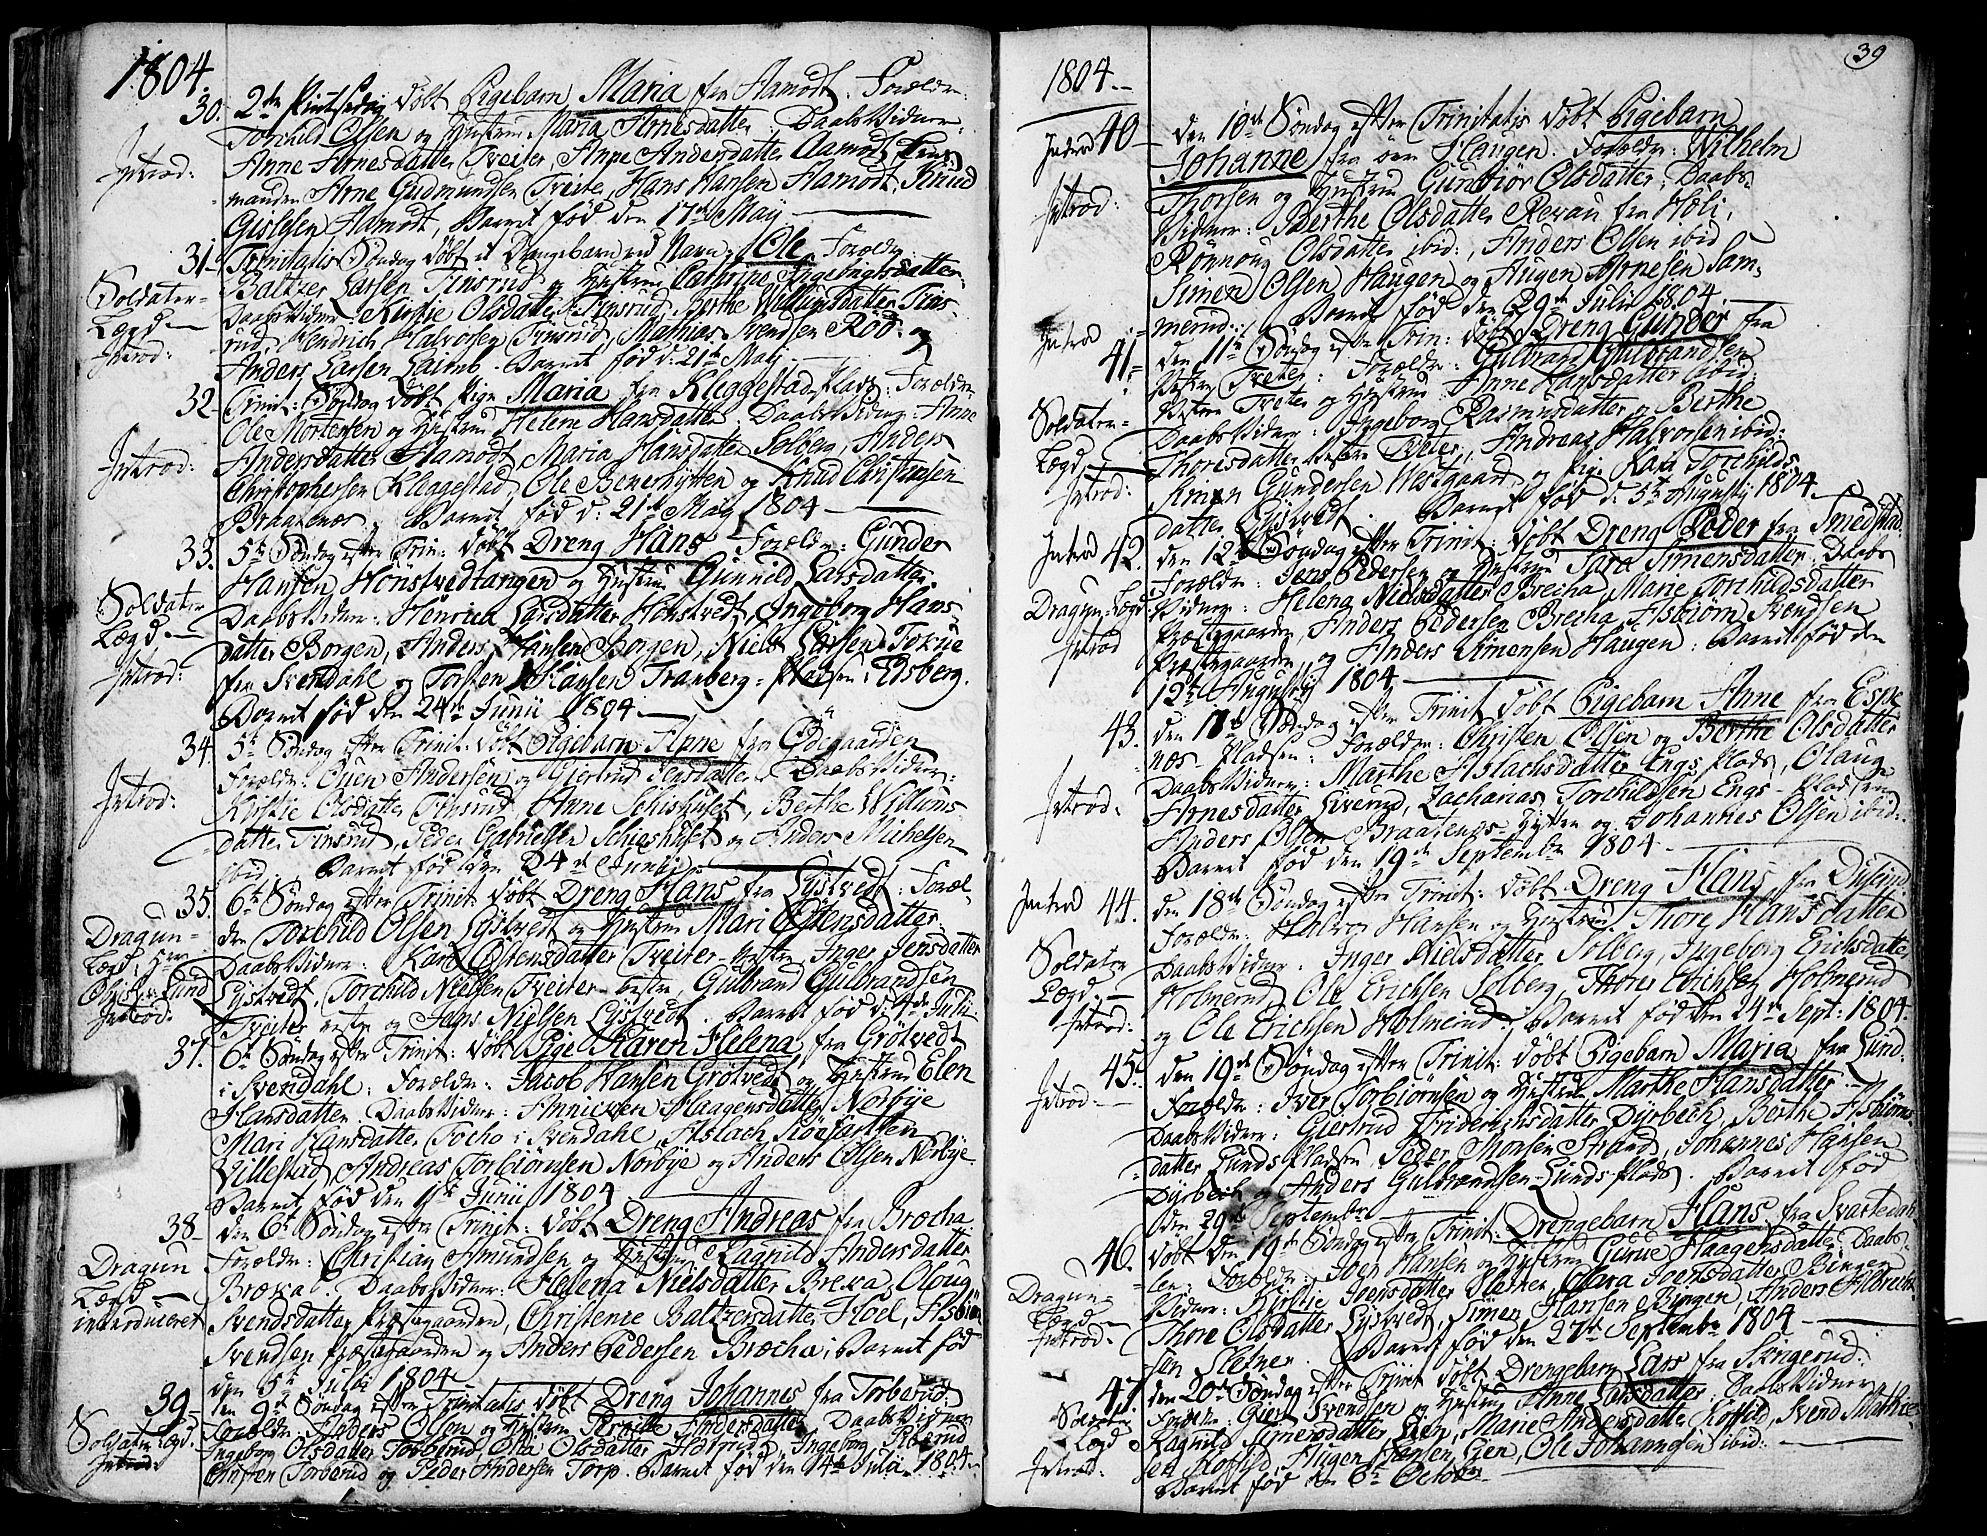 SAO, Skiptvet prestekontor Kirkebøker, F/Fa/L0004: Ministerialbok nr. 4, 1794-1814, s. 39